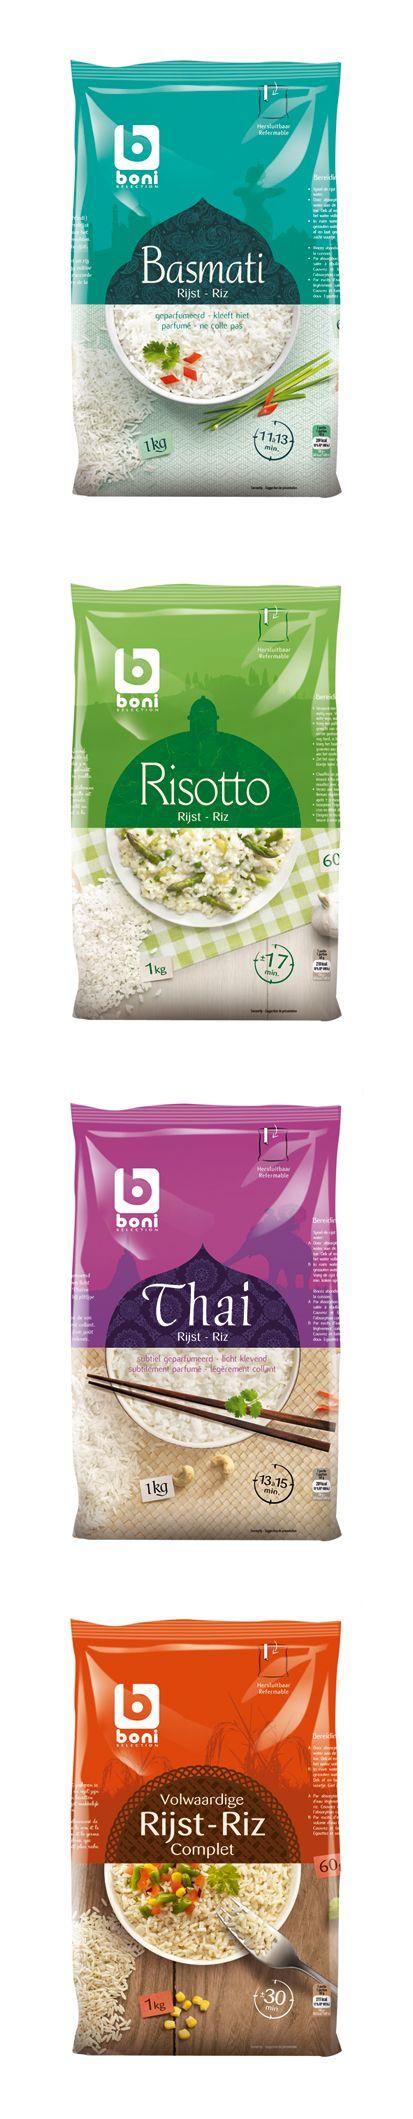 Boni rice #creatice #ads #rice #packaging